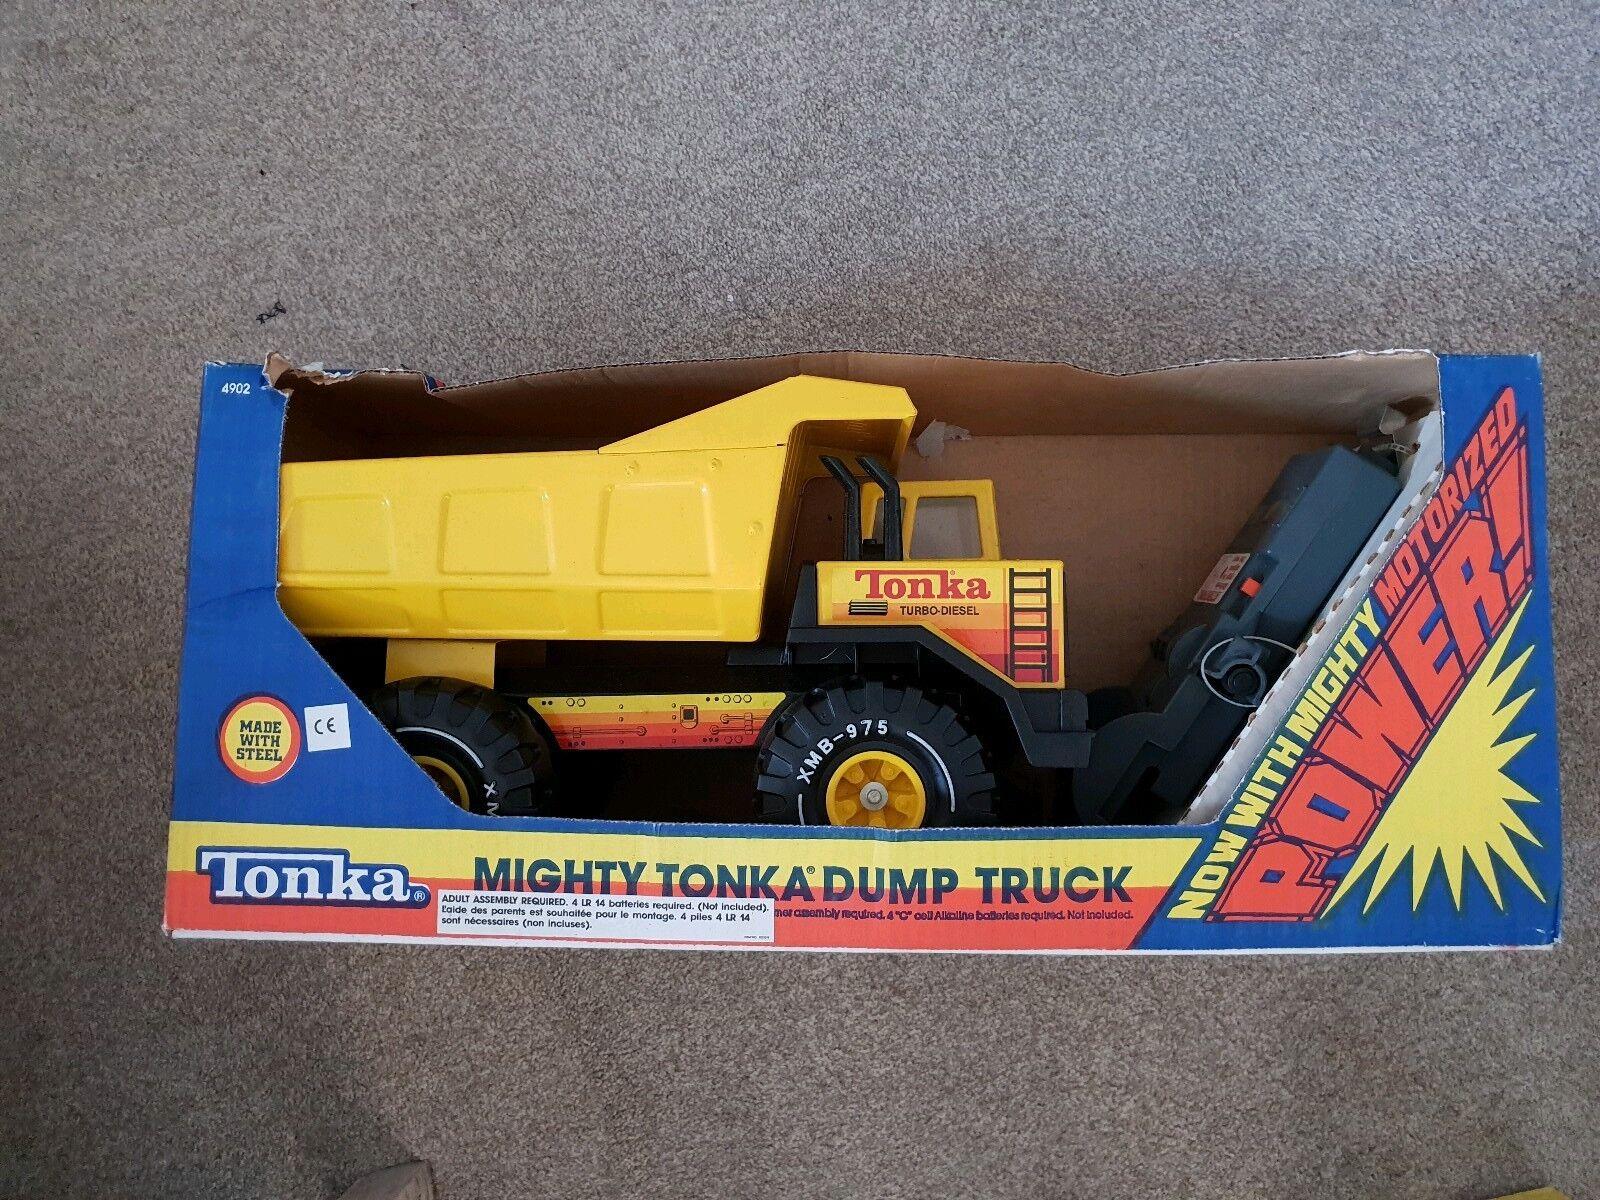 TONKA motorisé Mighty camion benne 1989 vintage rare NEUF